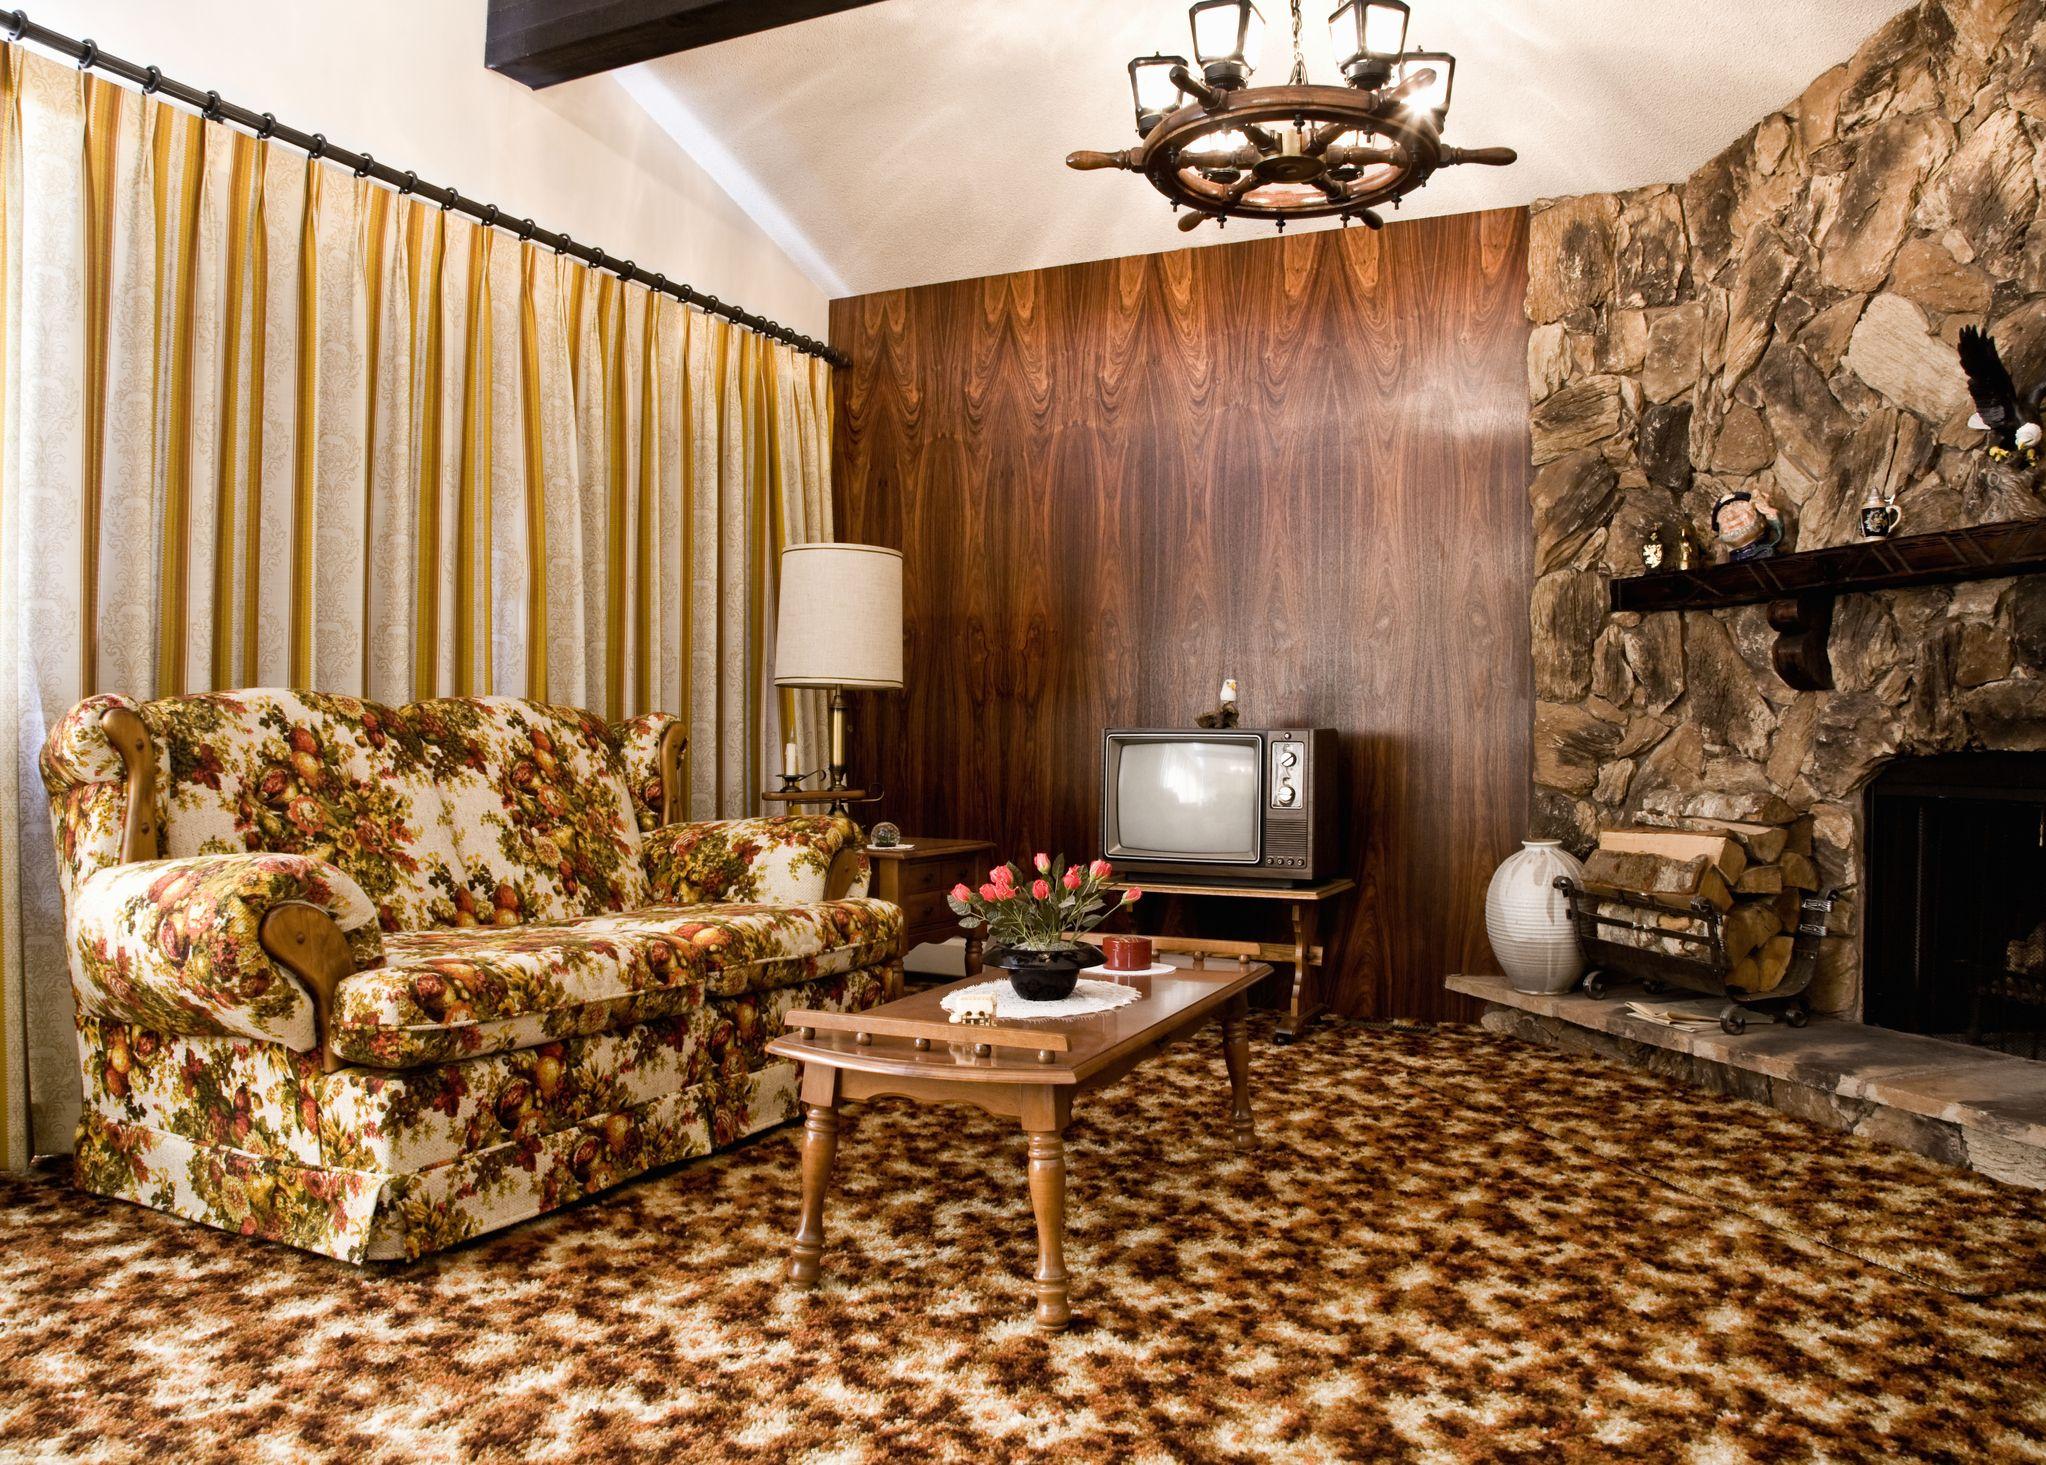 1970s-era-living-room-royalty-free-image-1576602746.jpg